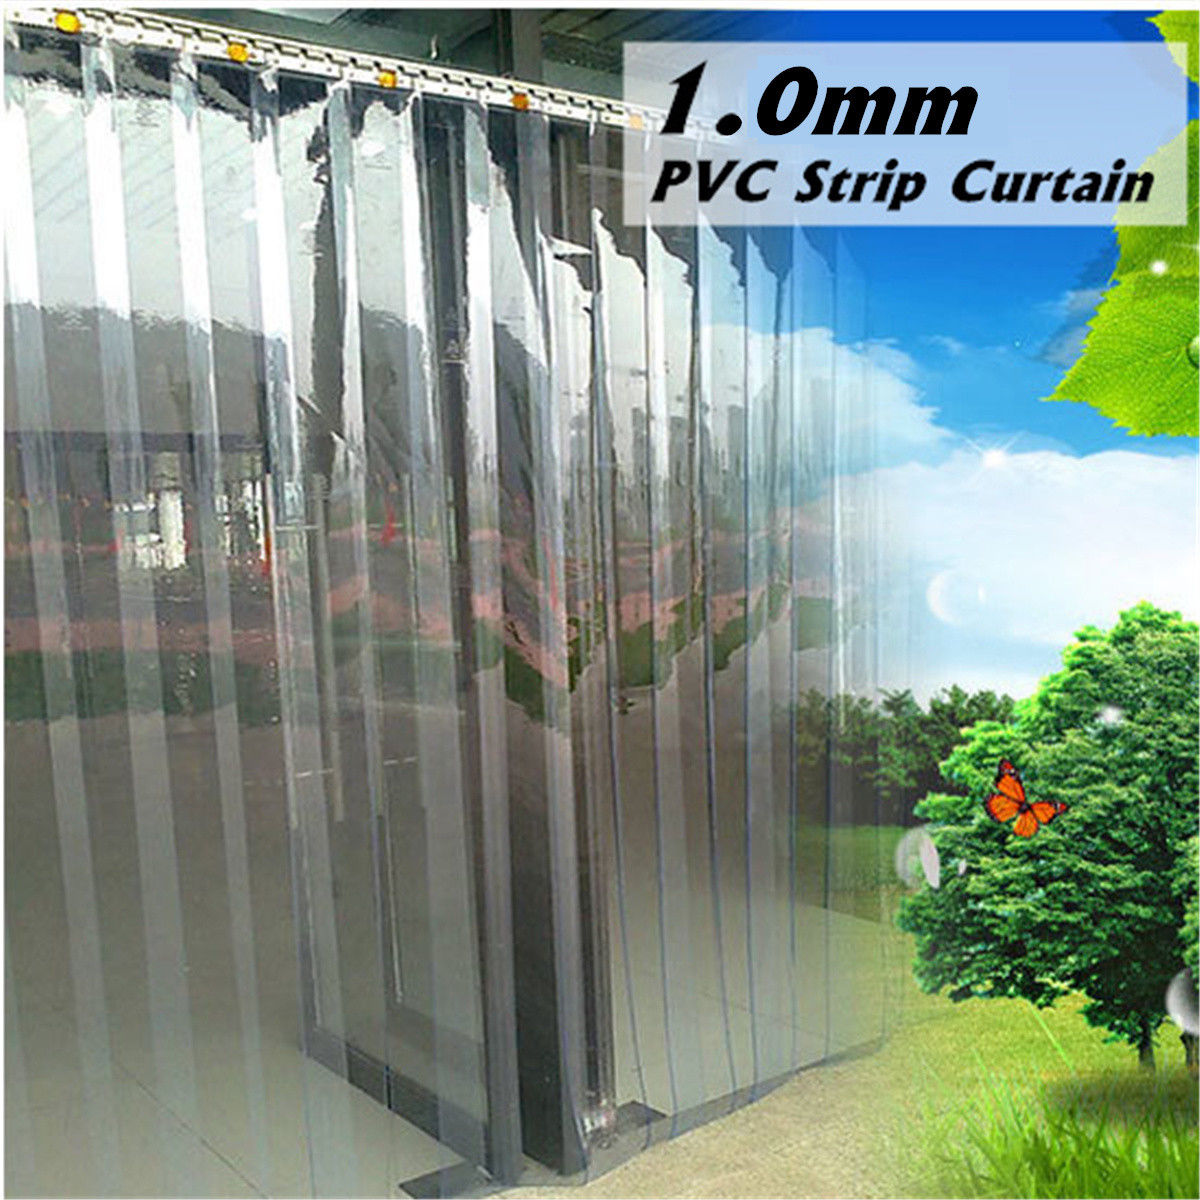 PVC Refrigeration Strip Curtain Door Strips Only 4 Meter Drop 3mmX 300mm Wide